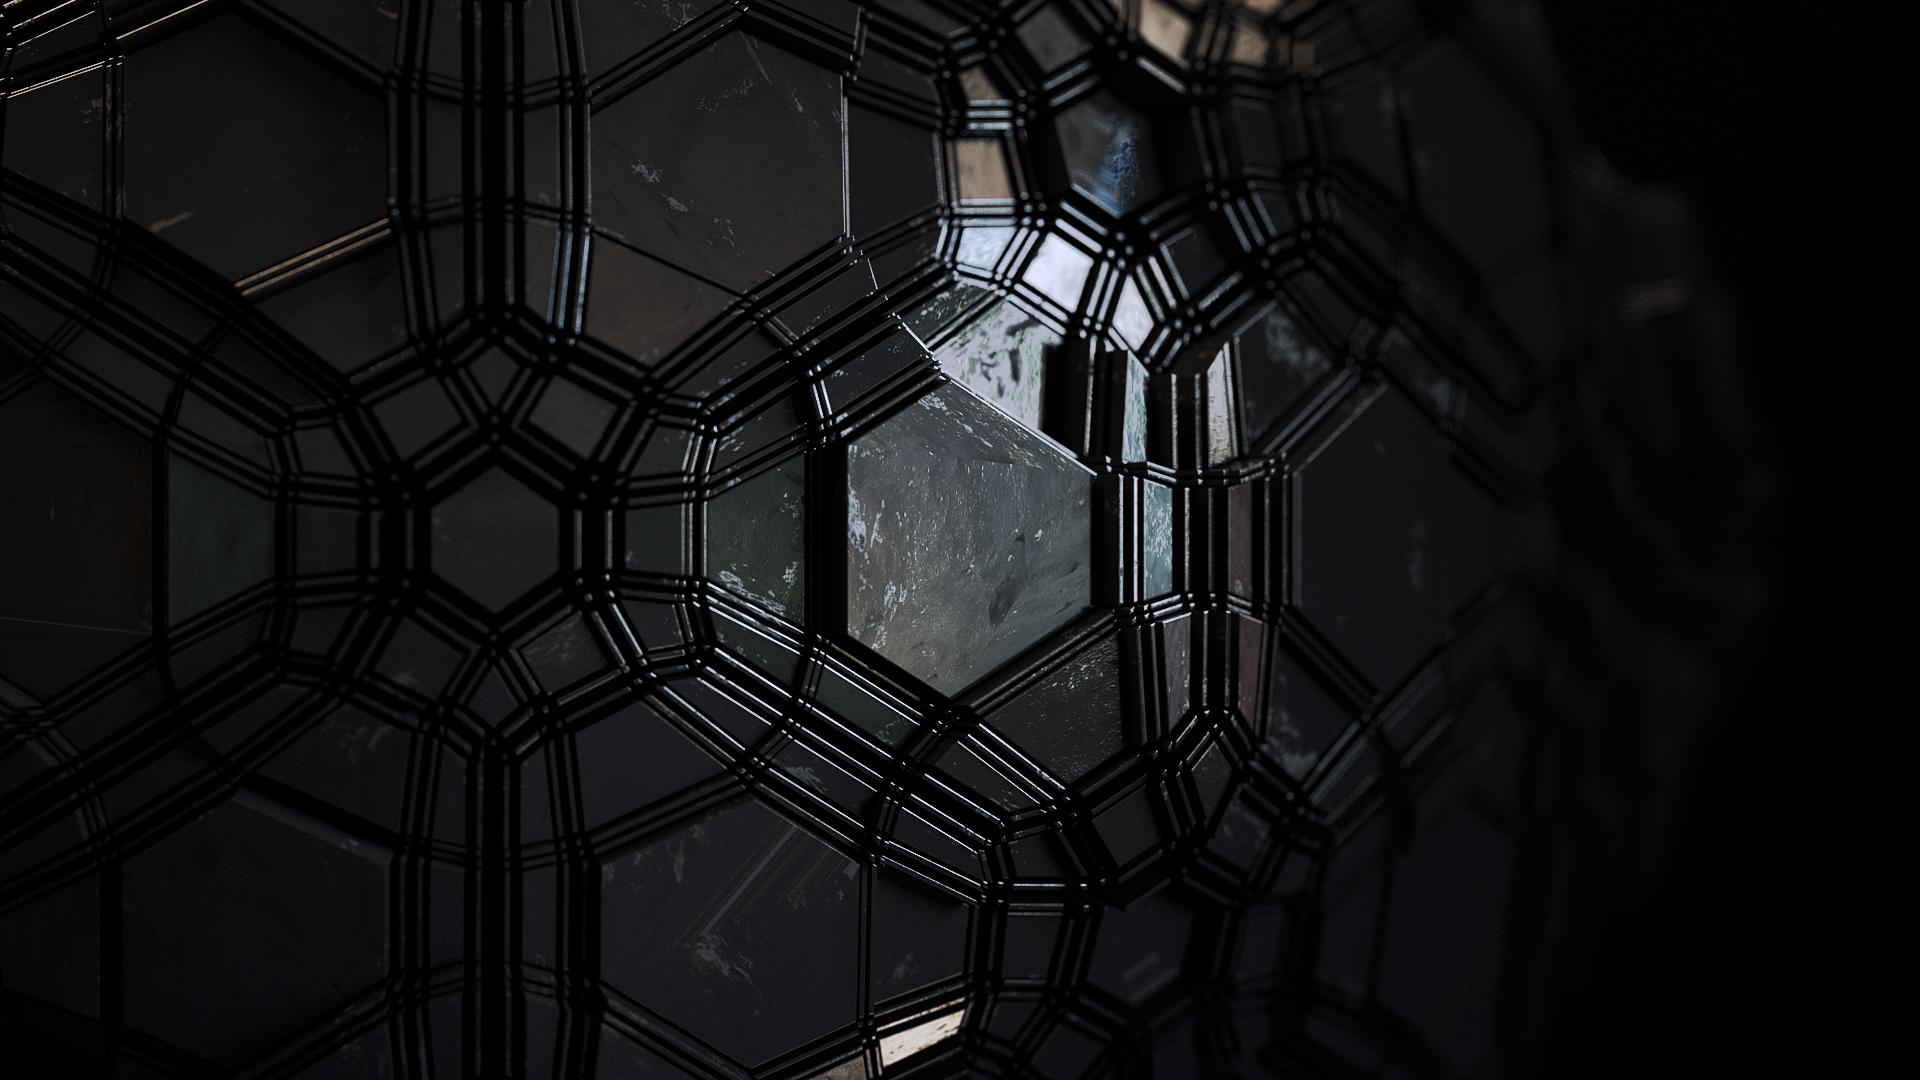 Frames_Cell_MW_A001.jpg